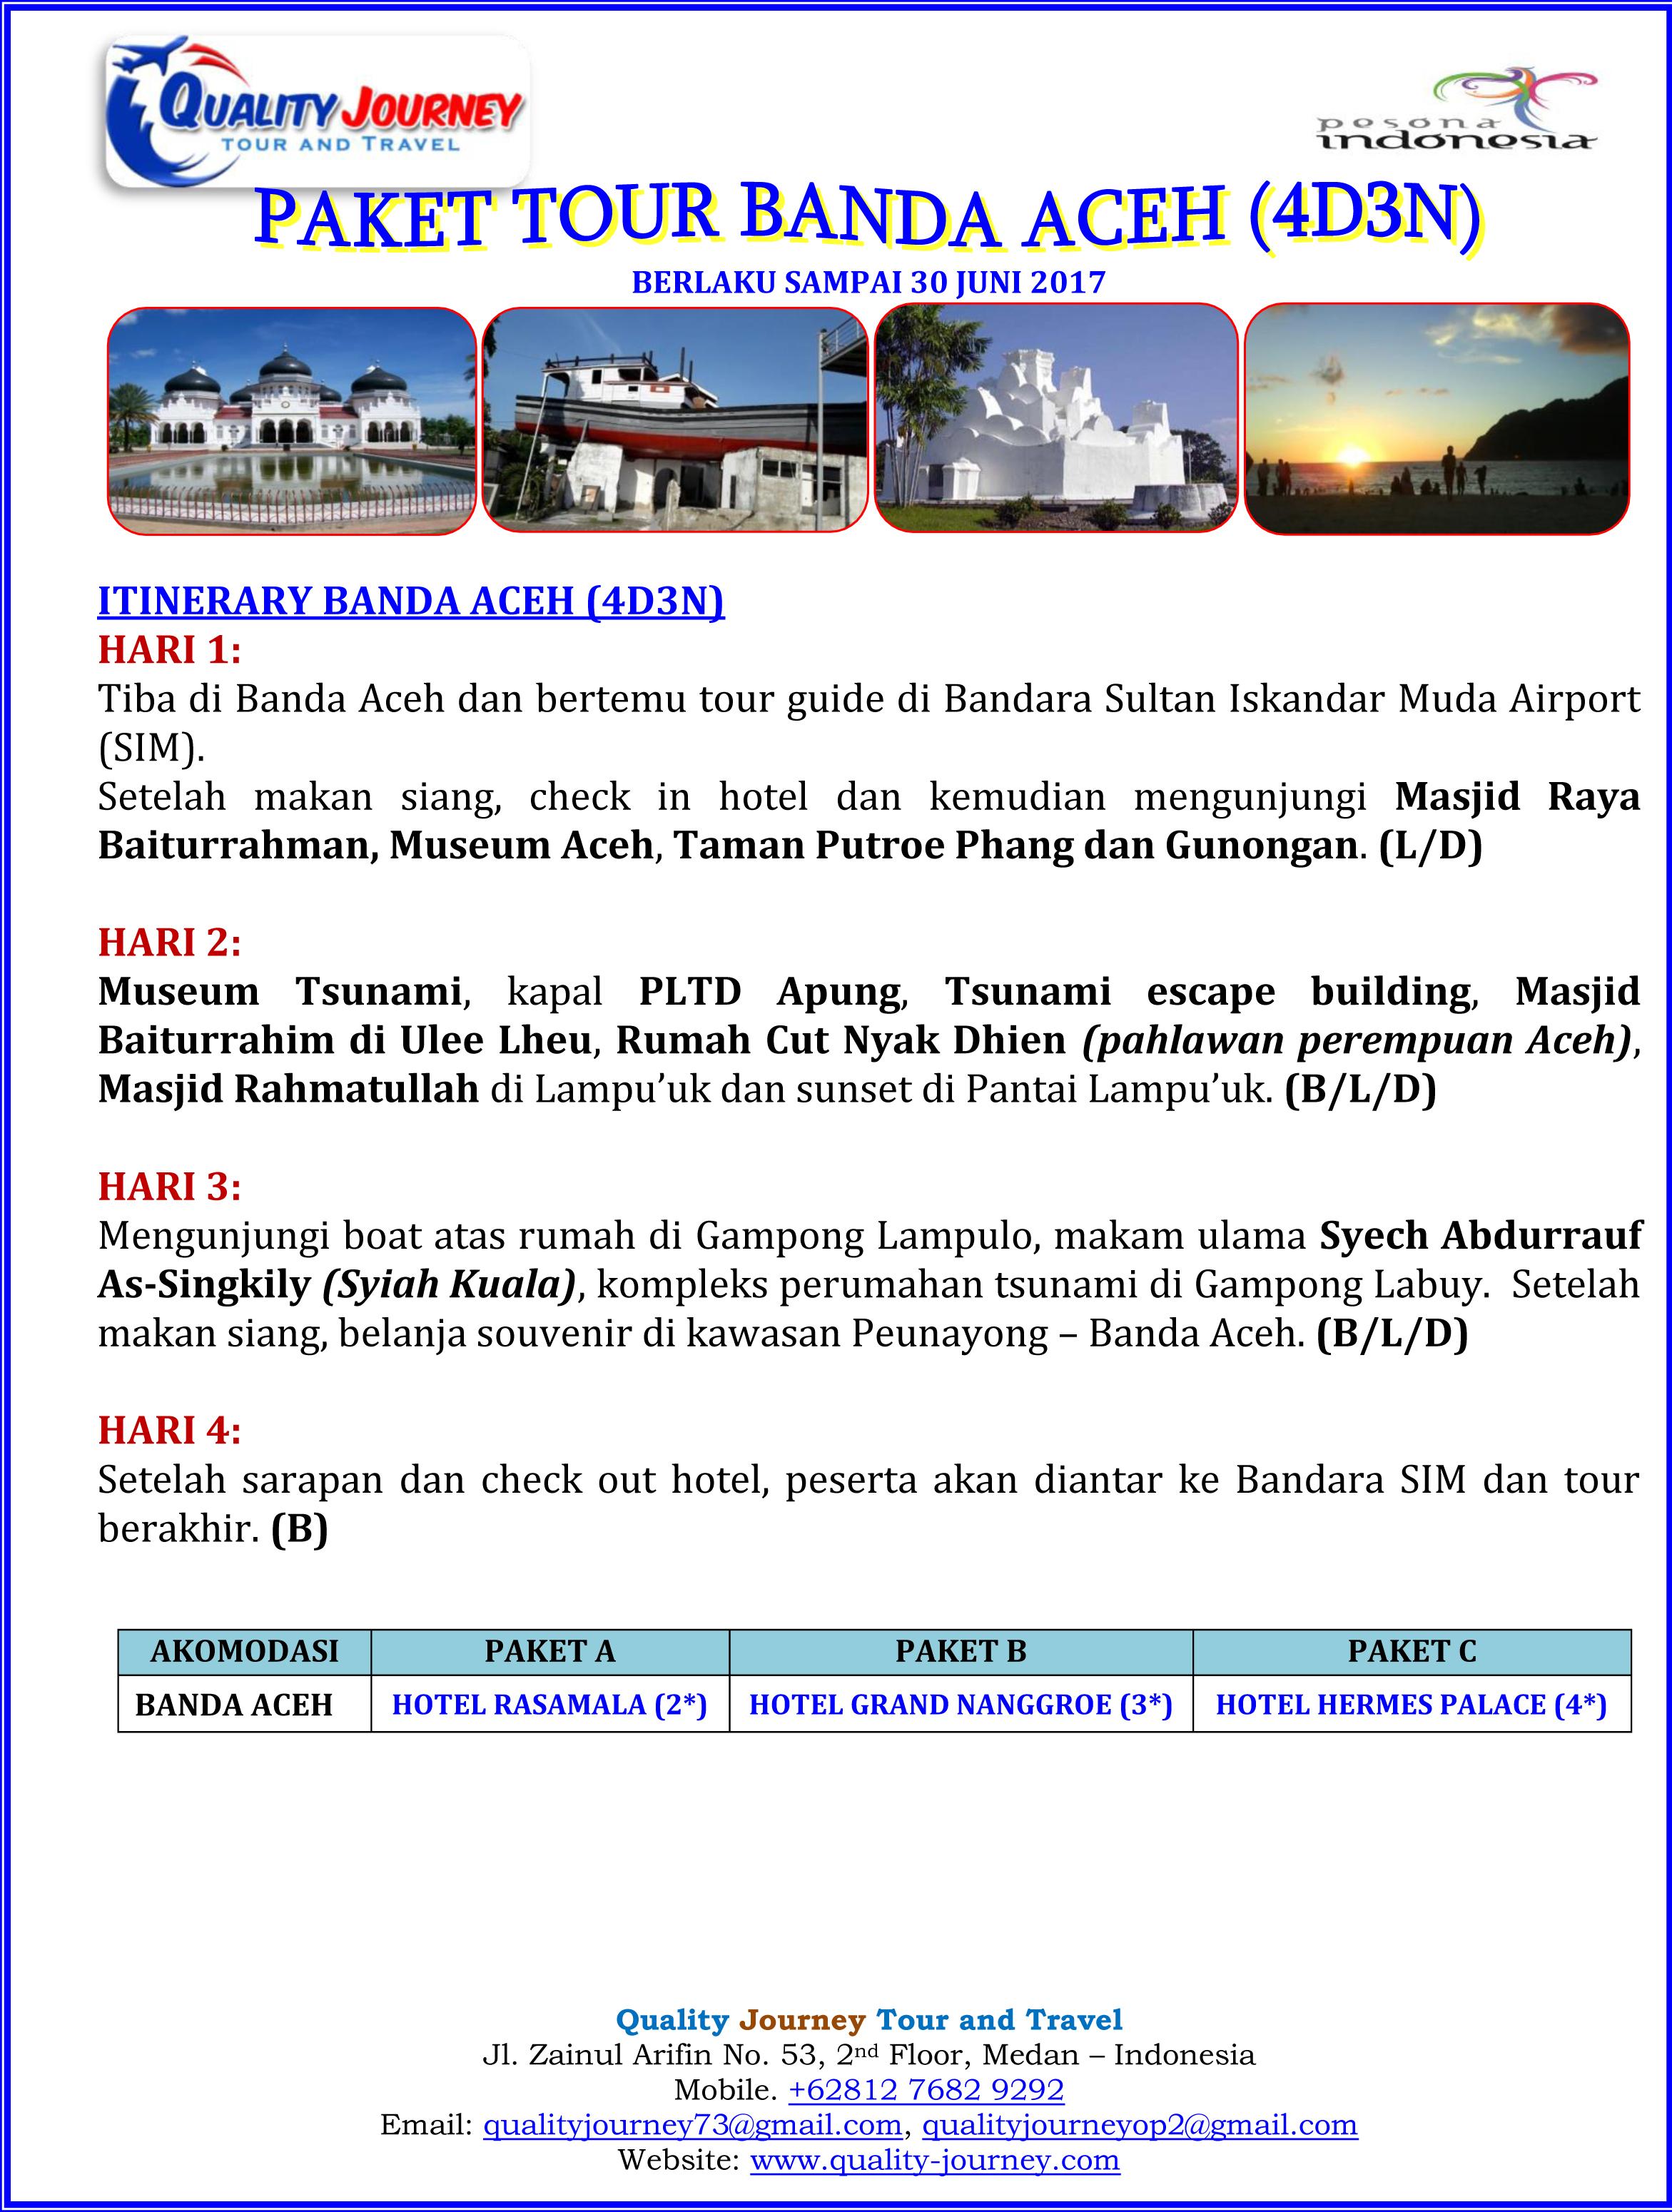 4d3n Tour Banda Aceh Quality Journey Paket 2017 1 Museum